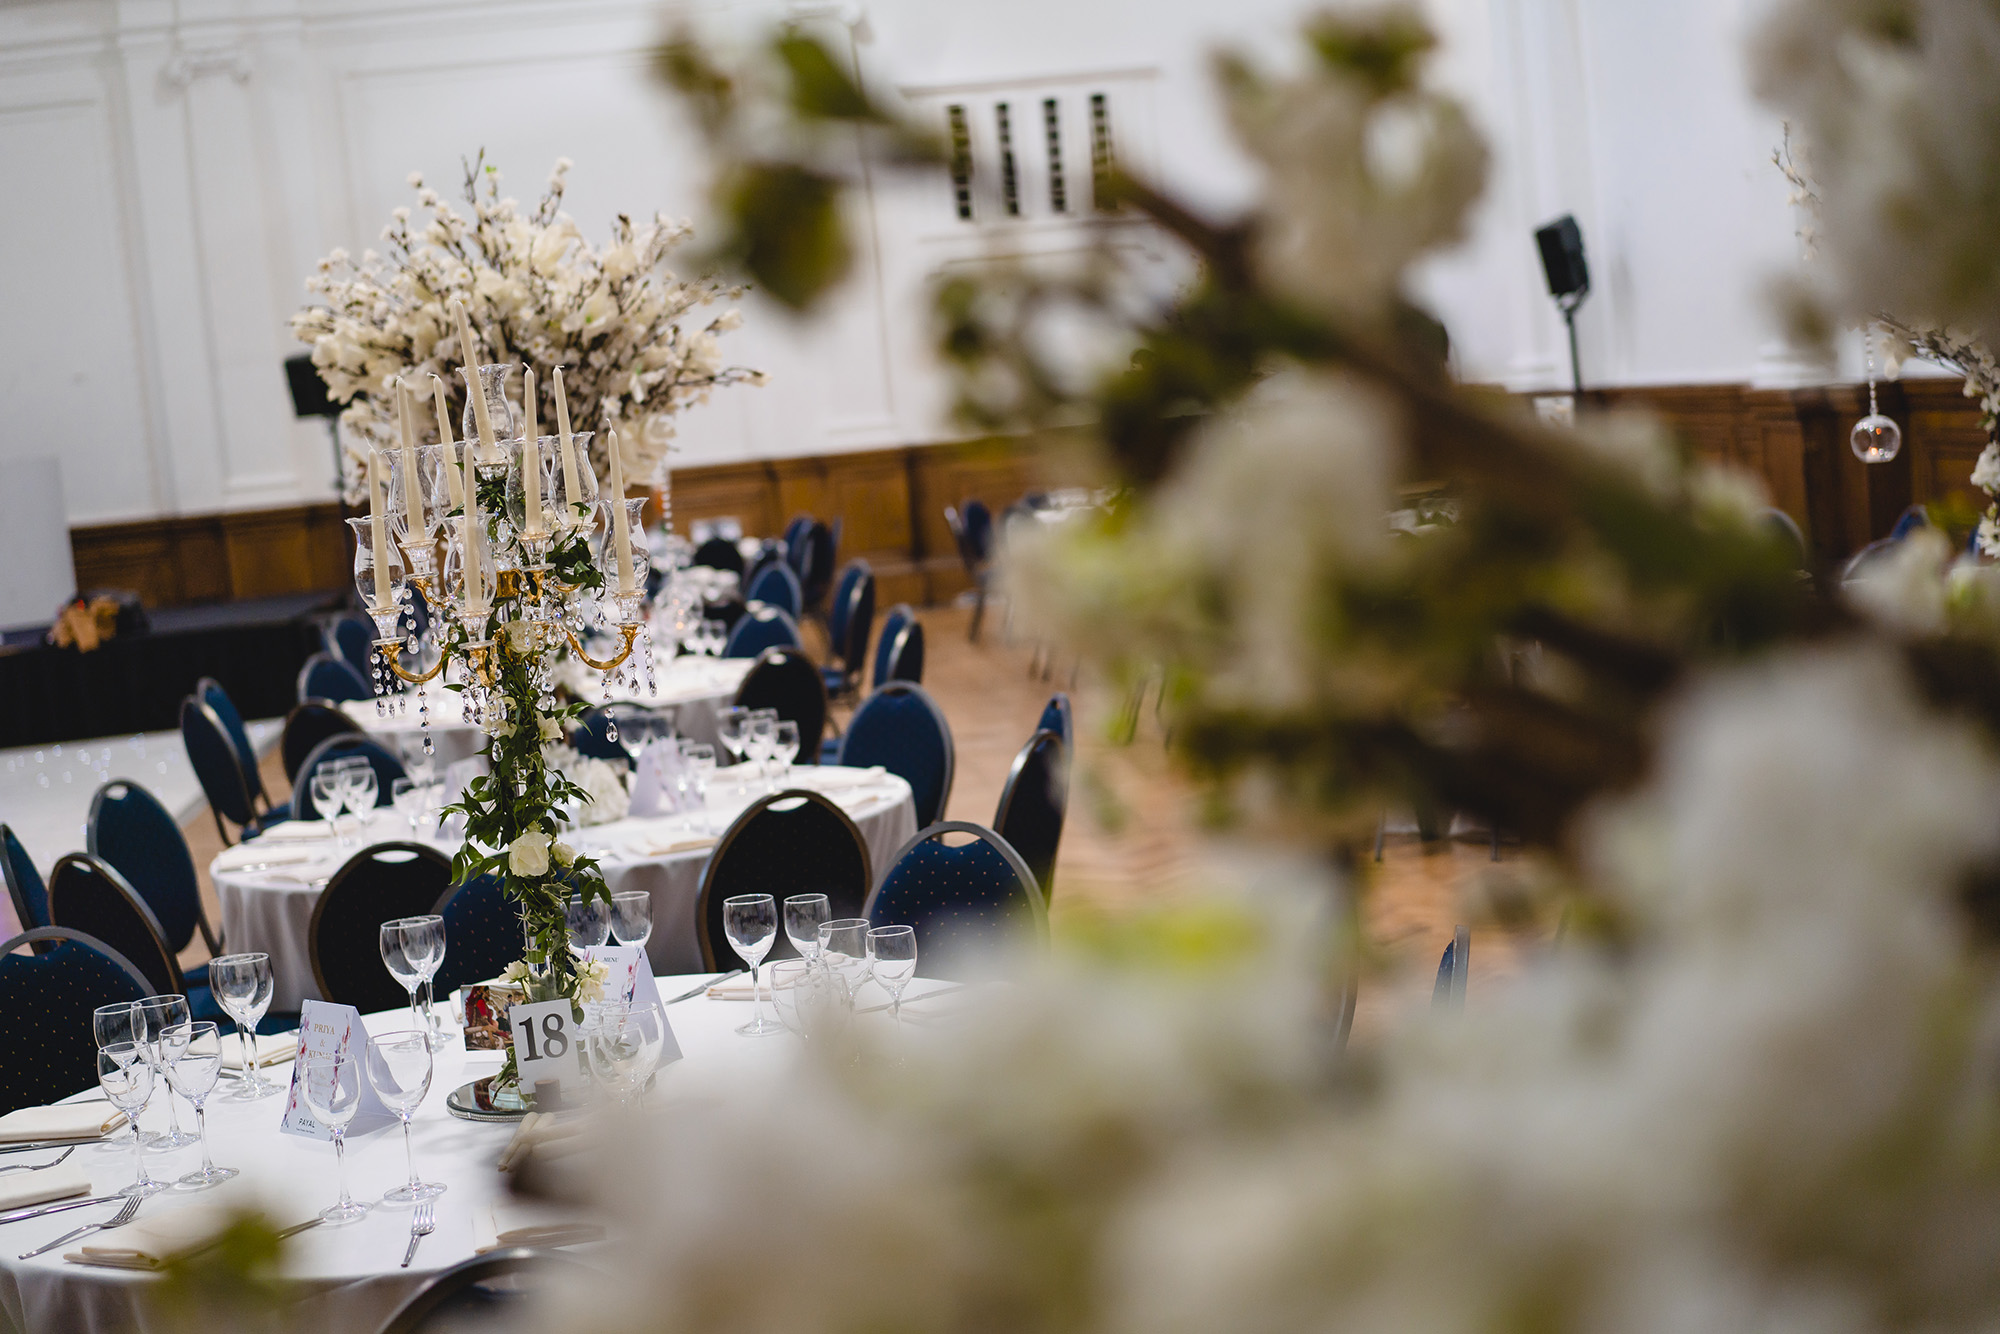 decor details at royal horticultural halls wedding reception